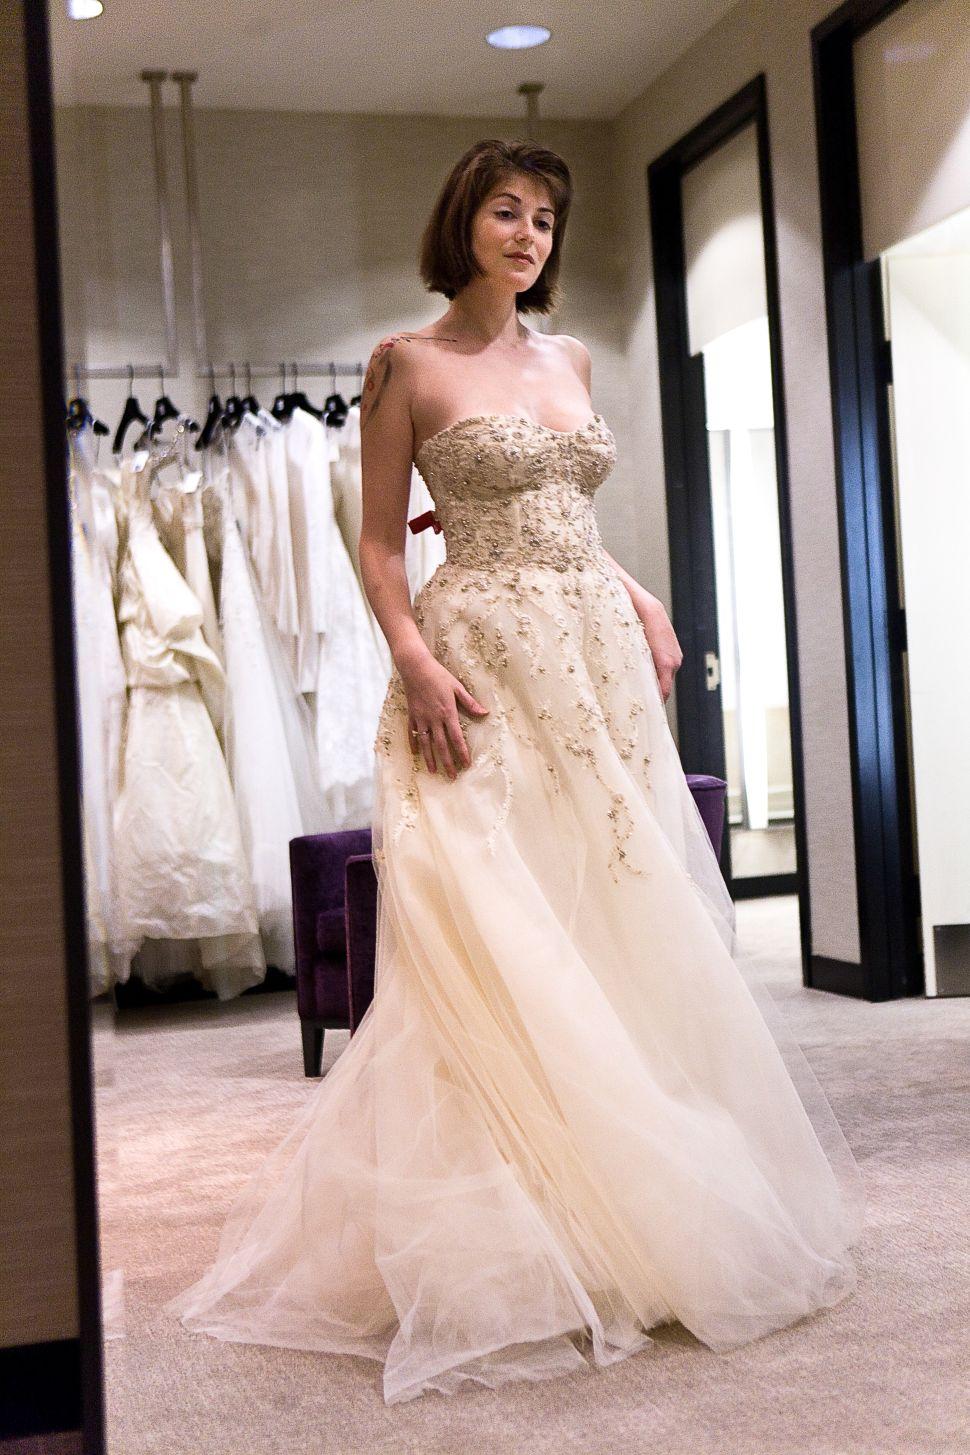 Menace To Society: Bridal Edition, Part 1